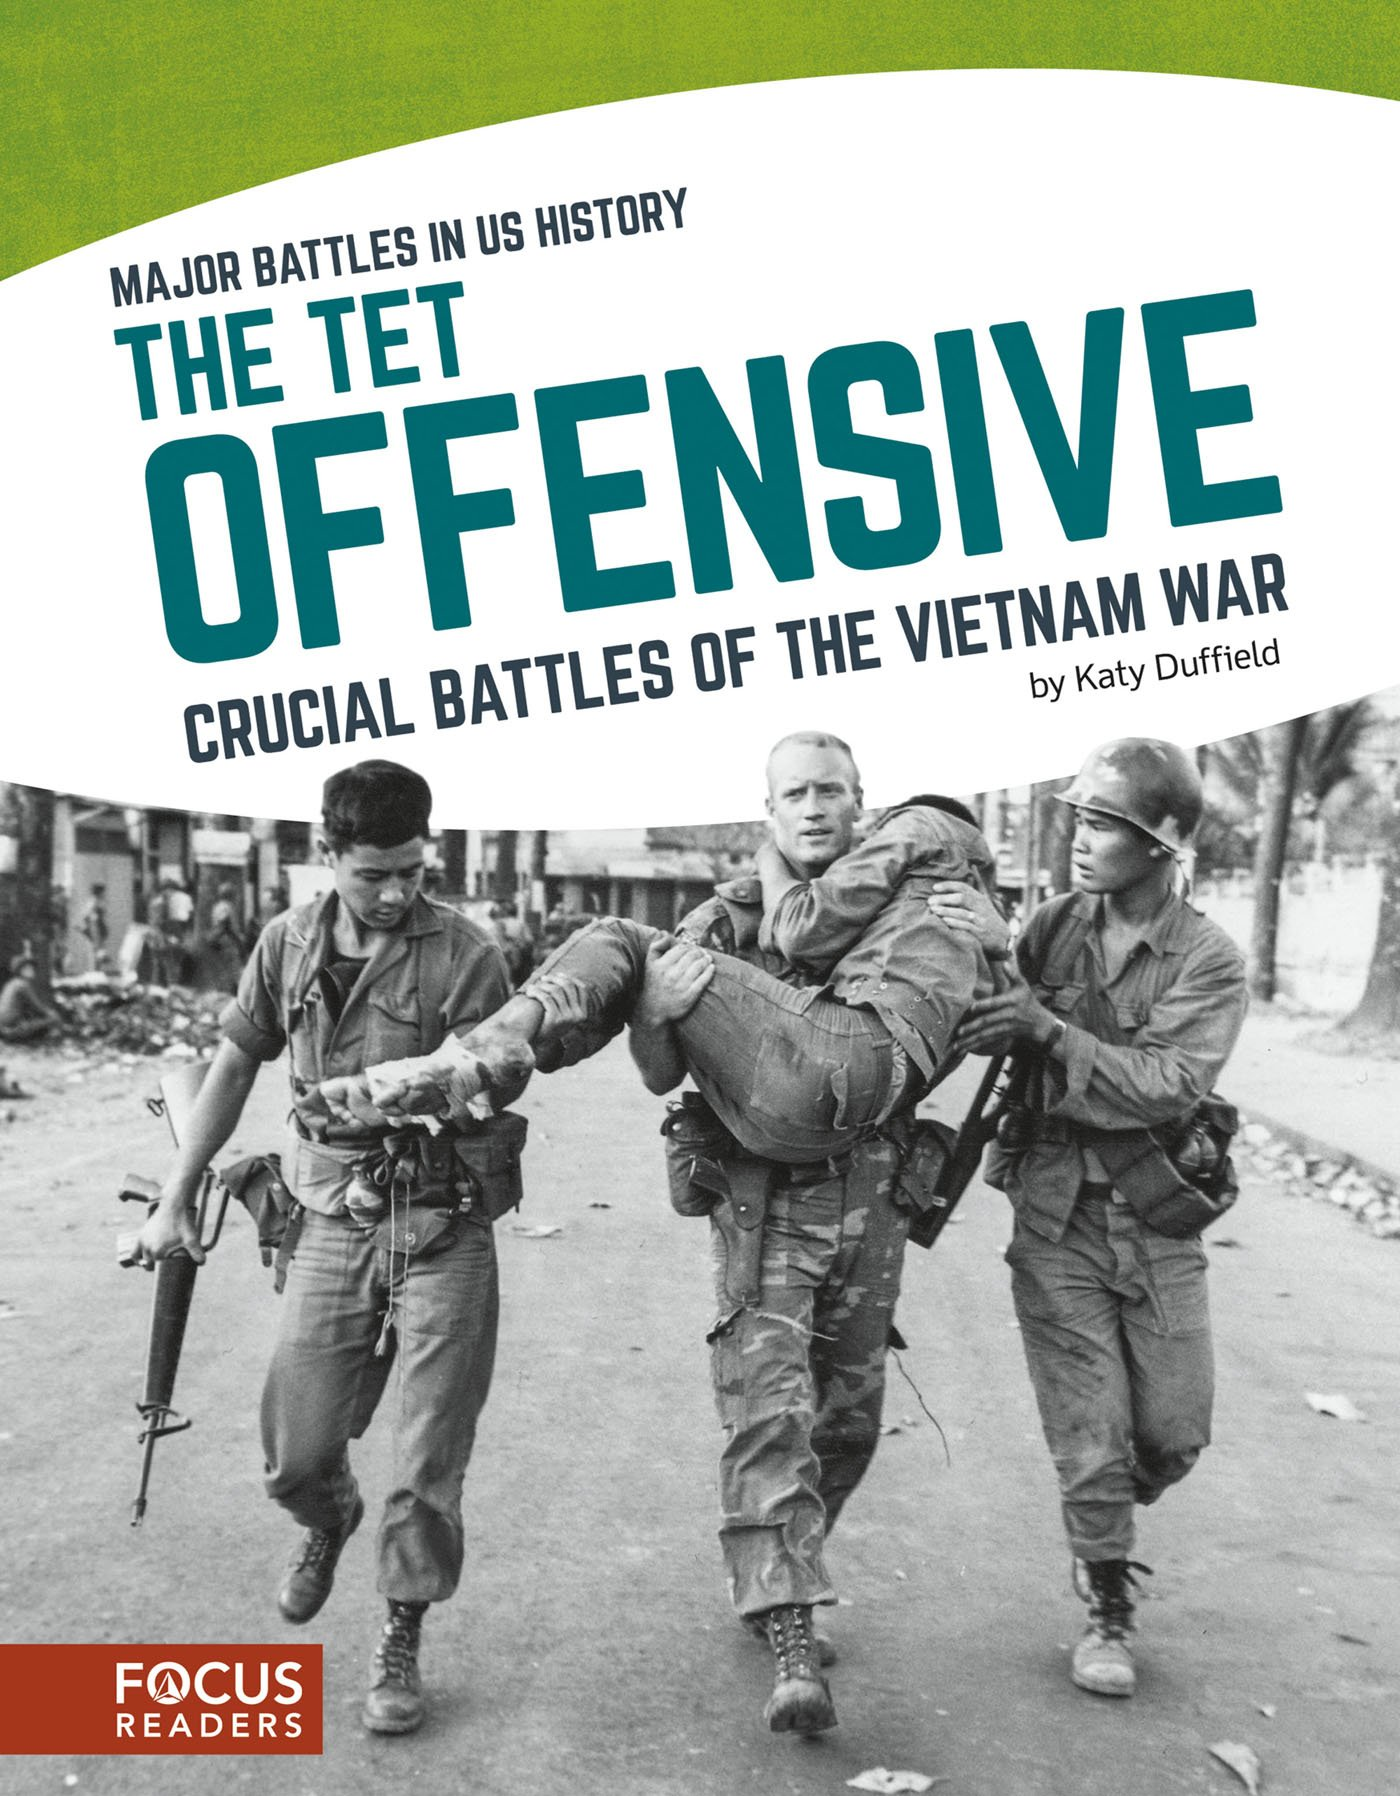 the-tet-offensive-crucial-battles-of-the-vietnam-war-major-battles-in-us-history